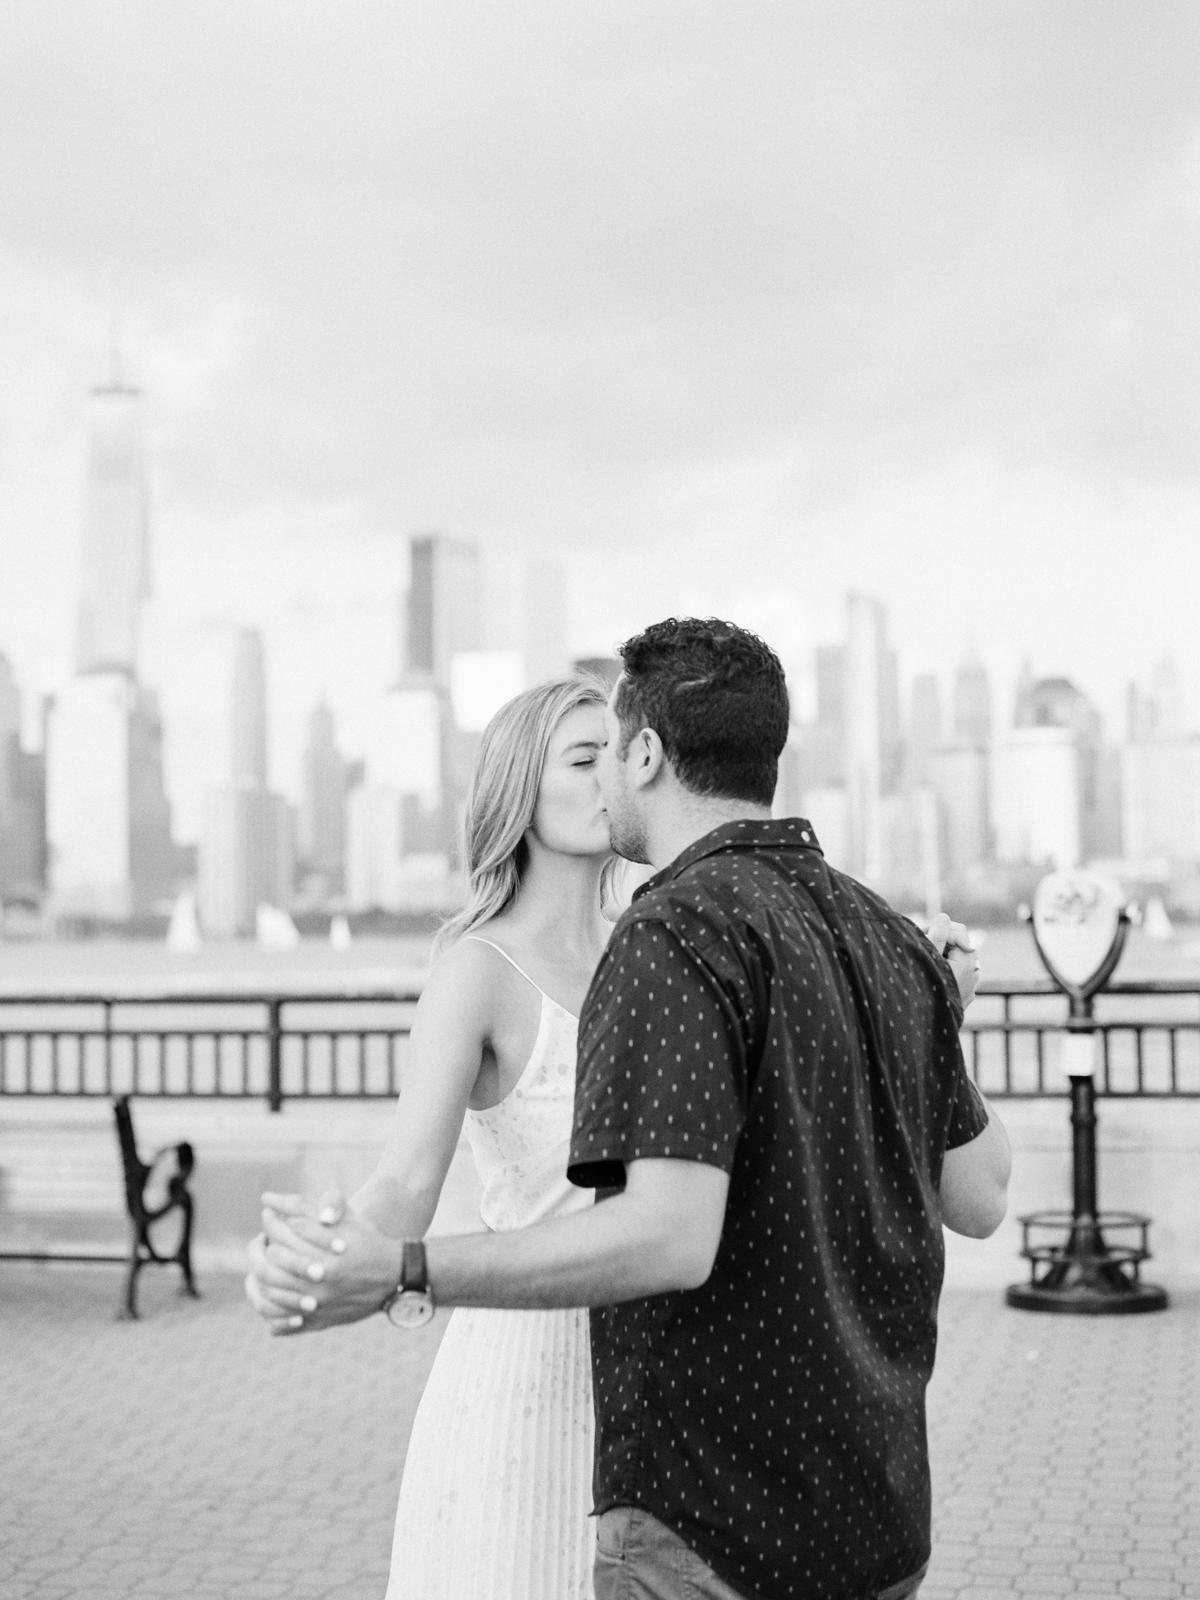 NYC-skyline-engagement-session-by-Tanya Isaeva-35.jpg